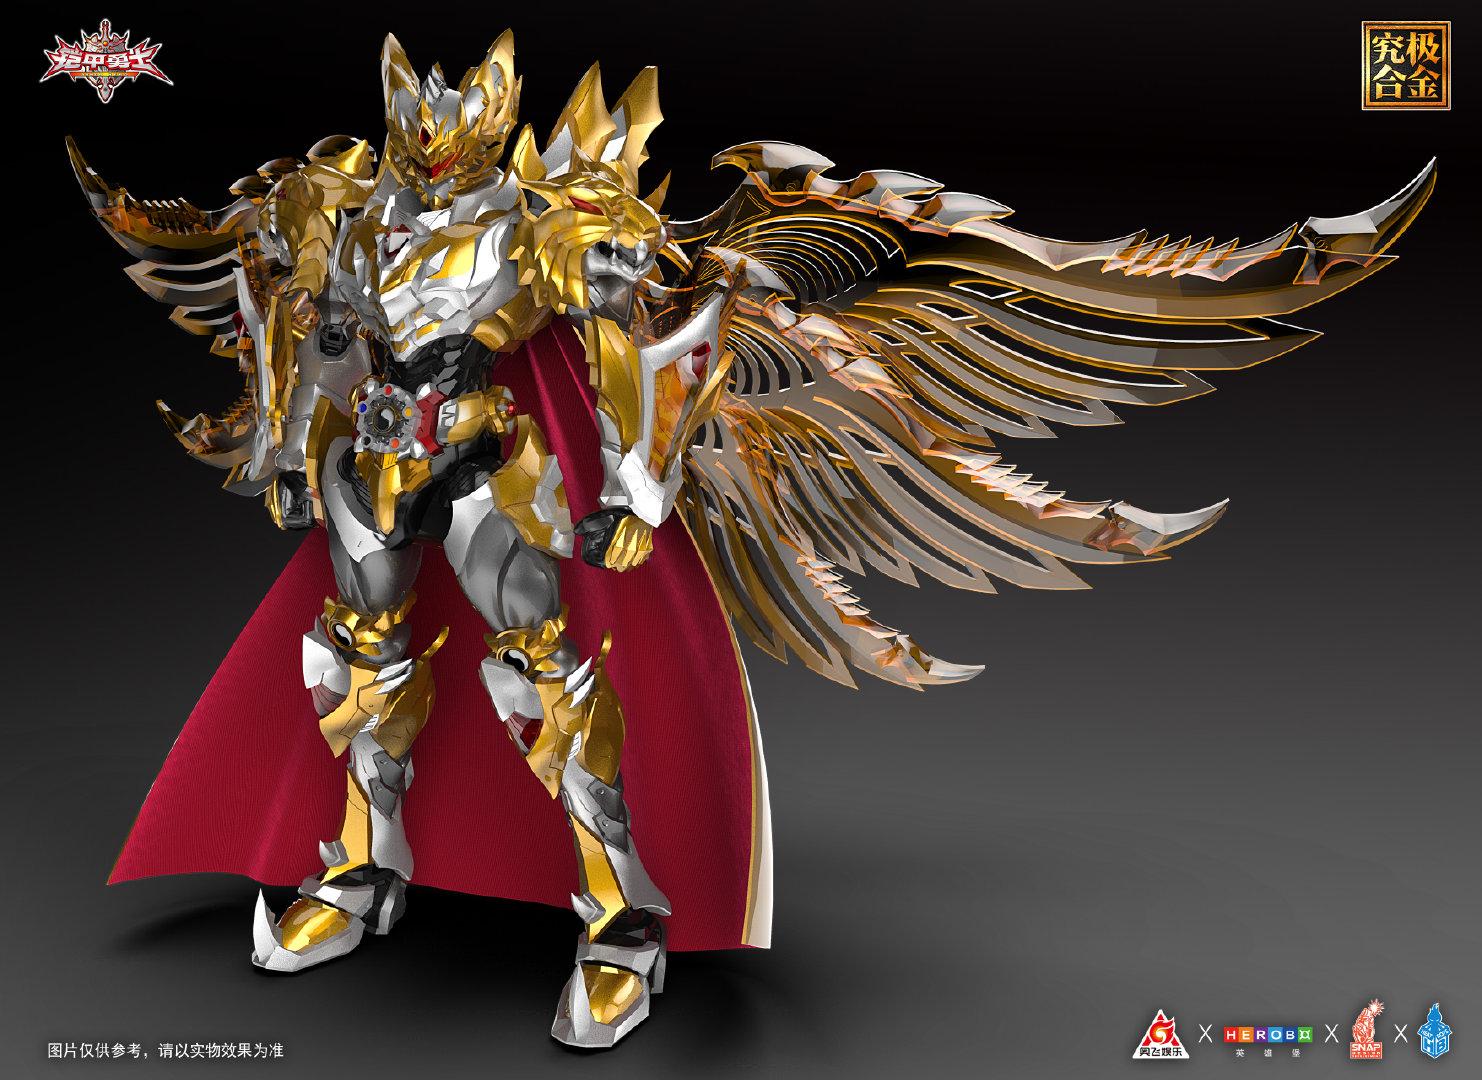 S535_Armor_hero_Emperor_039.jpg